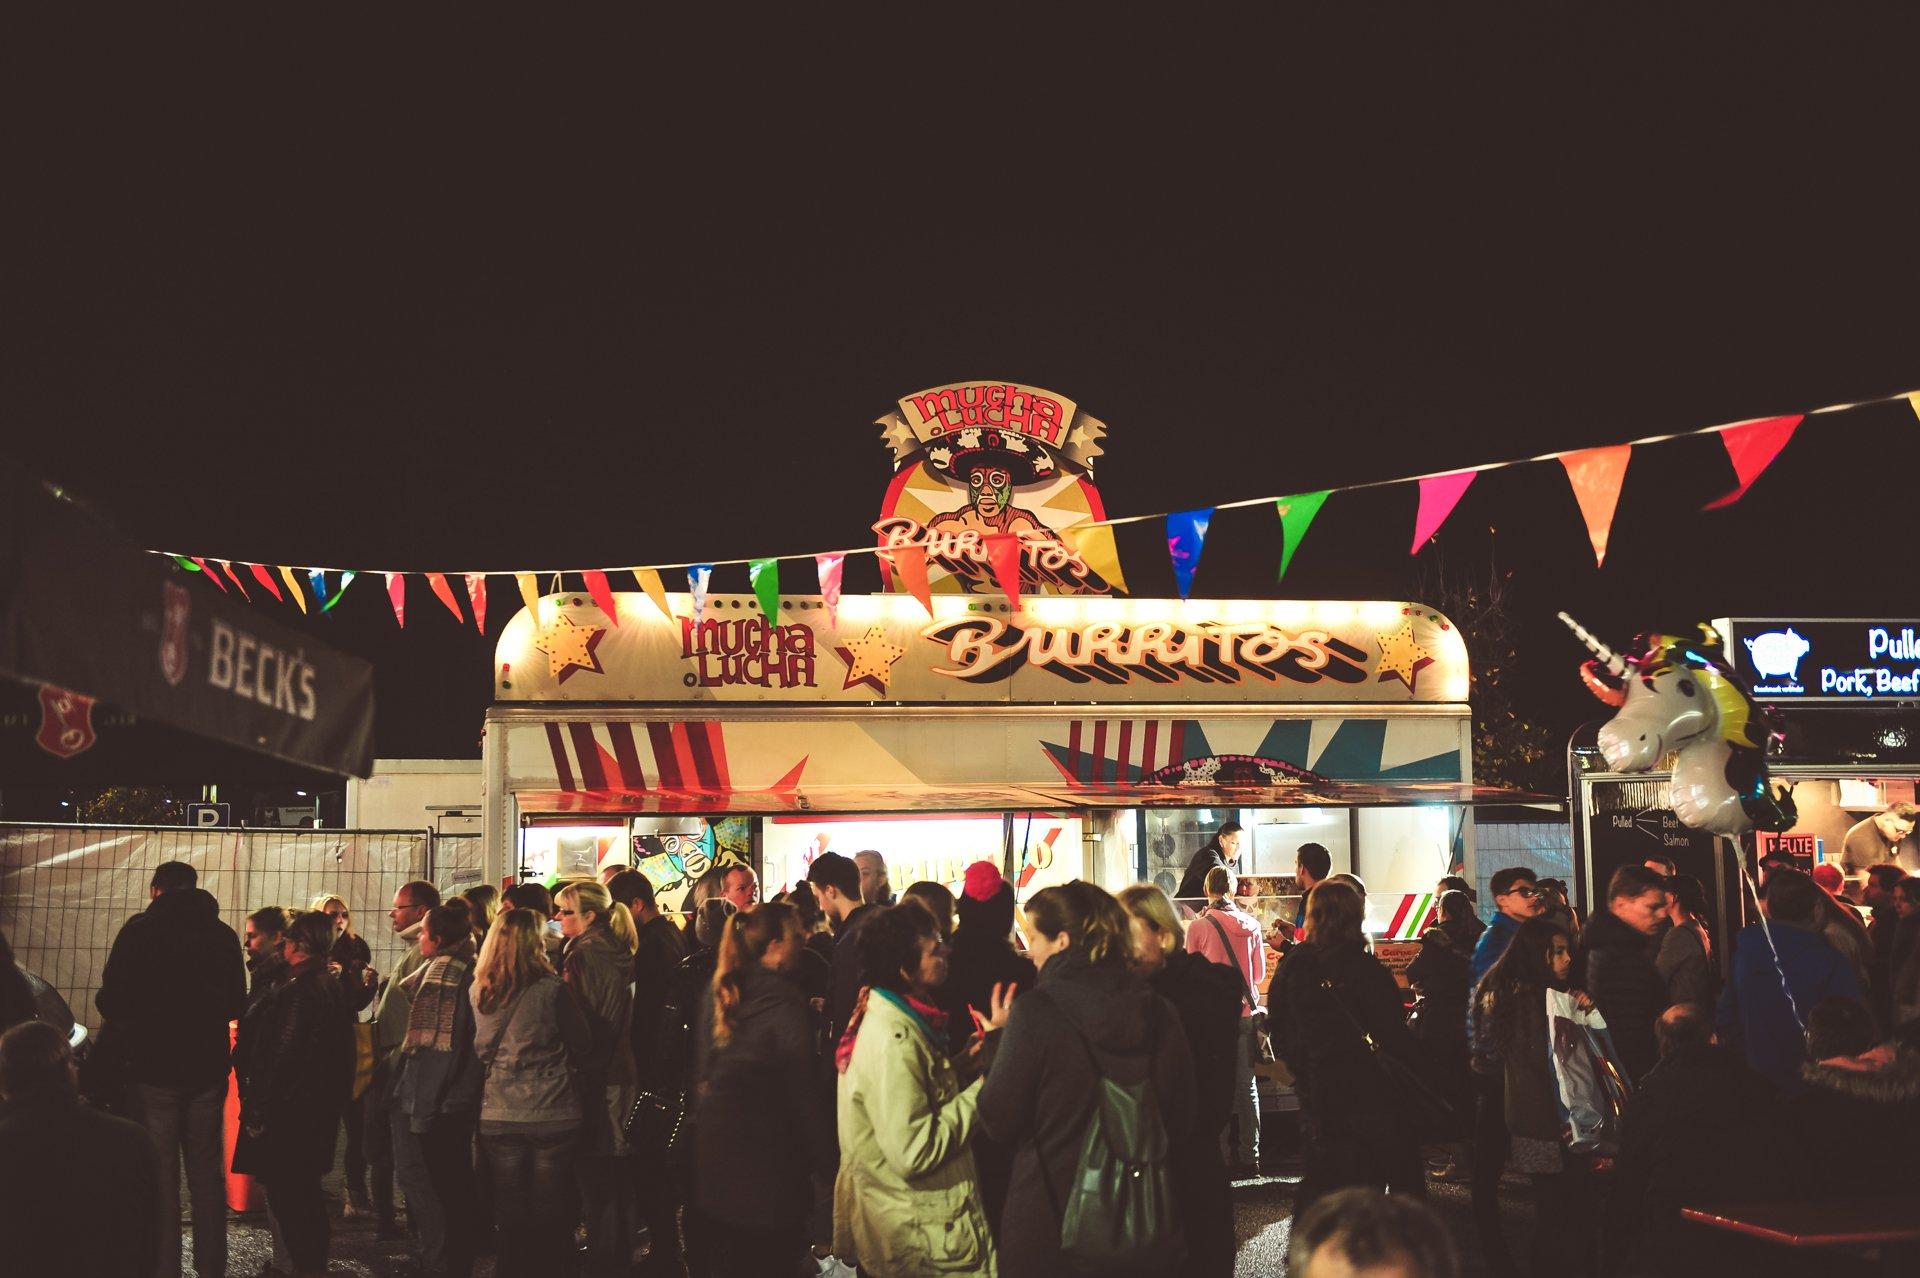 Food-Trailer für Street-Food Burritos